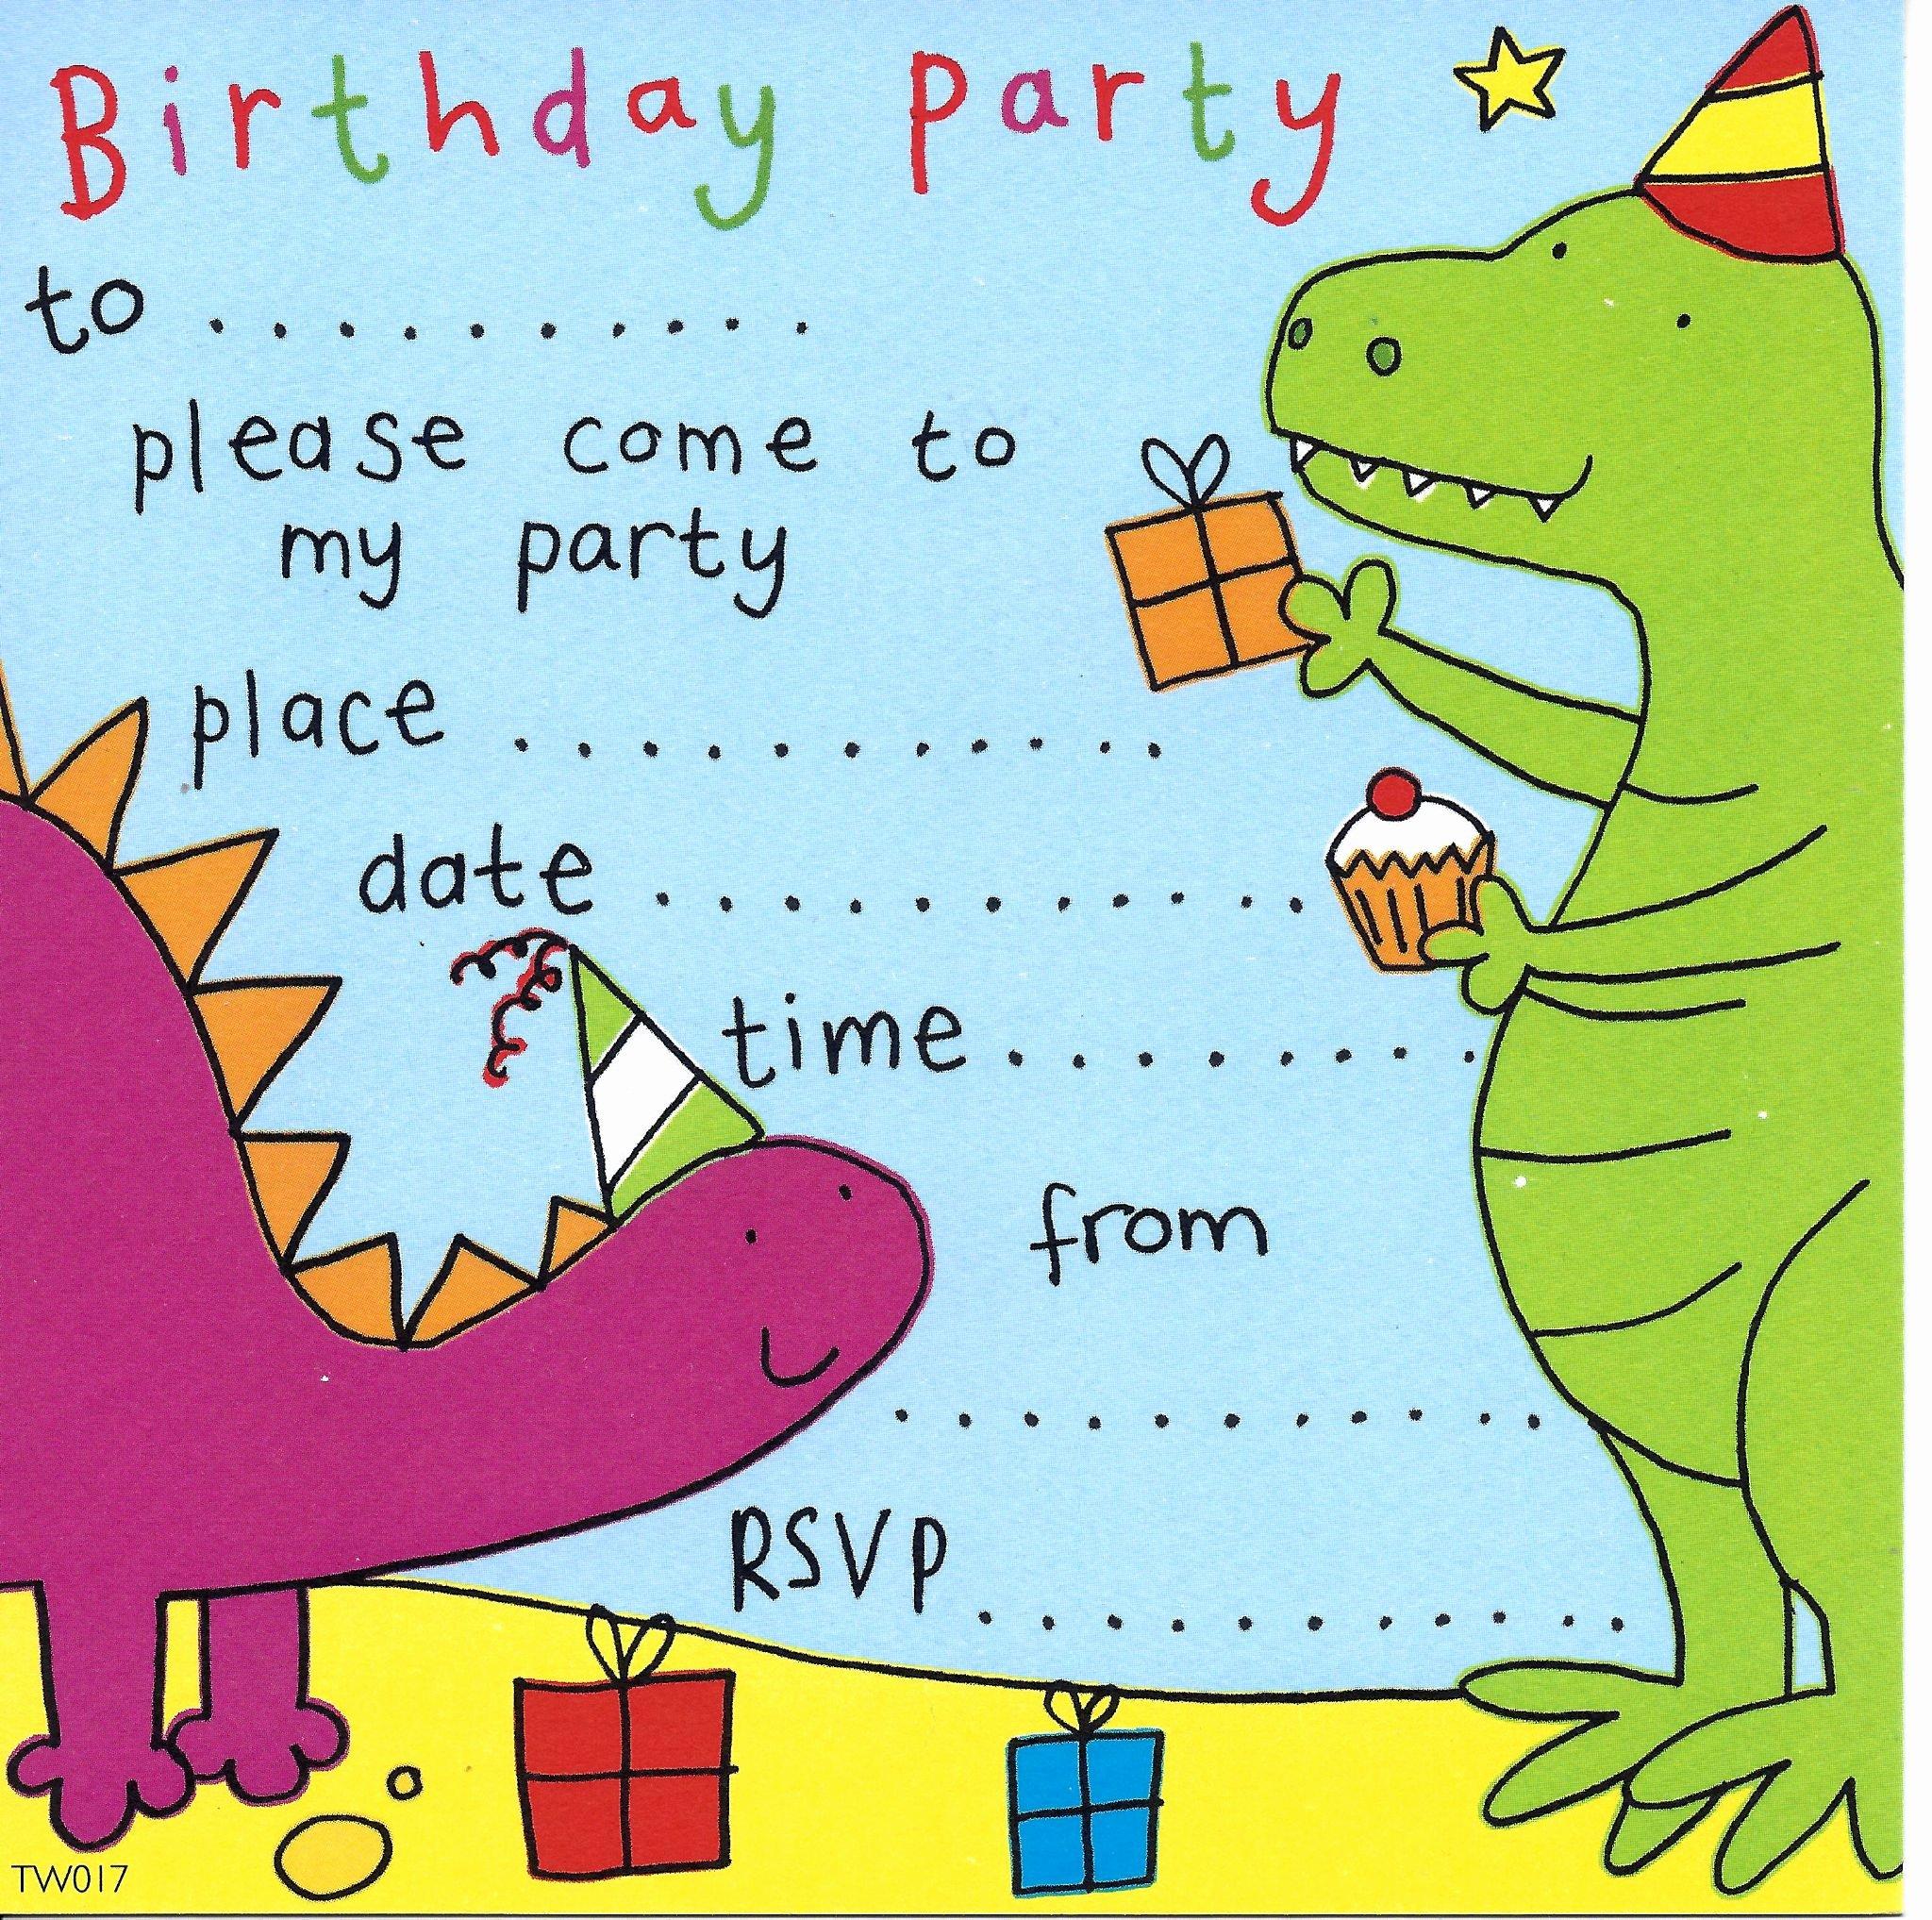 Dinosaur Birthday Party Invitations Best Of Party Invitations Birthday Party Invitations Kids Party Invitations Children S Party Invites